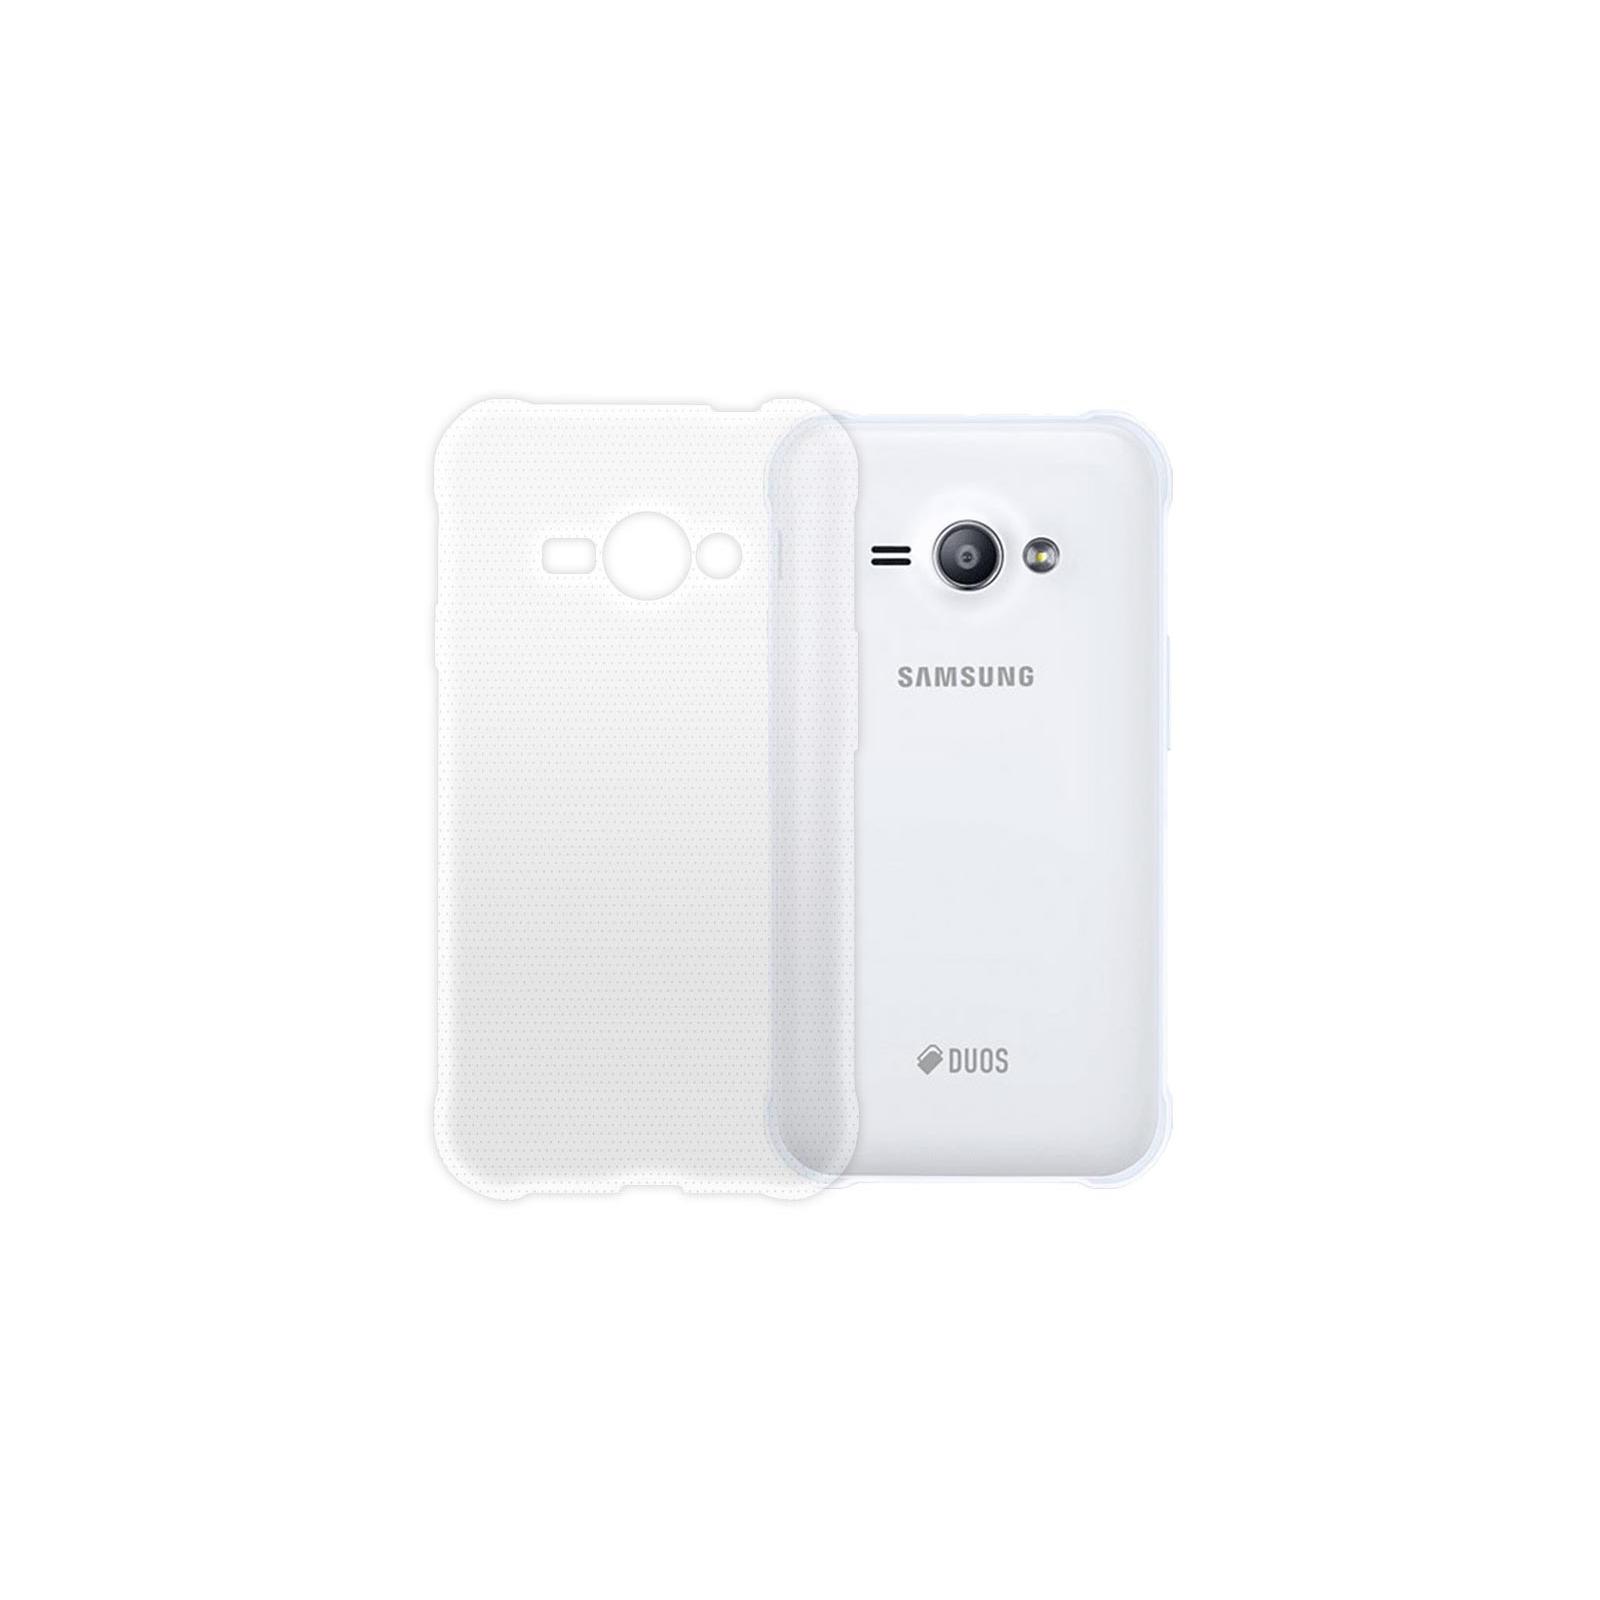 Чехол для моб. телефона GLOBAL для Samsung J110 Ace (светлый) (1283126468575)